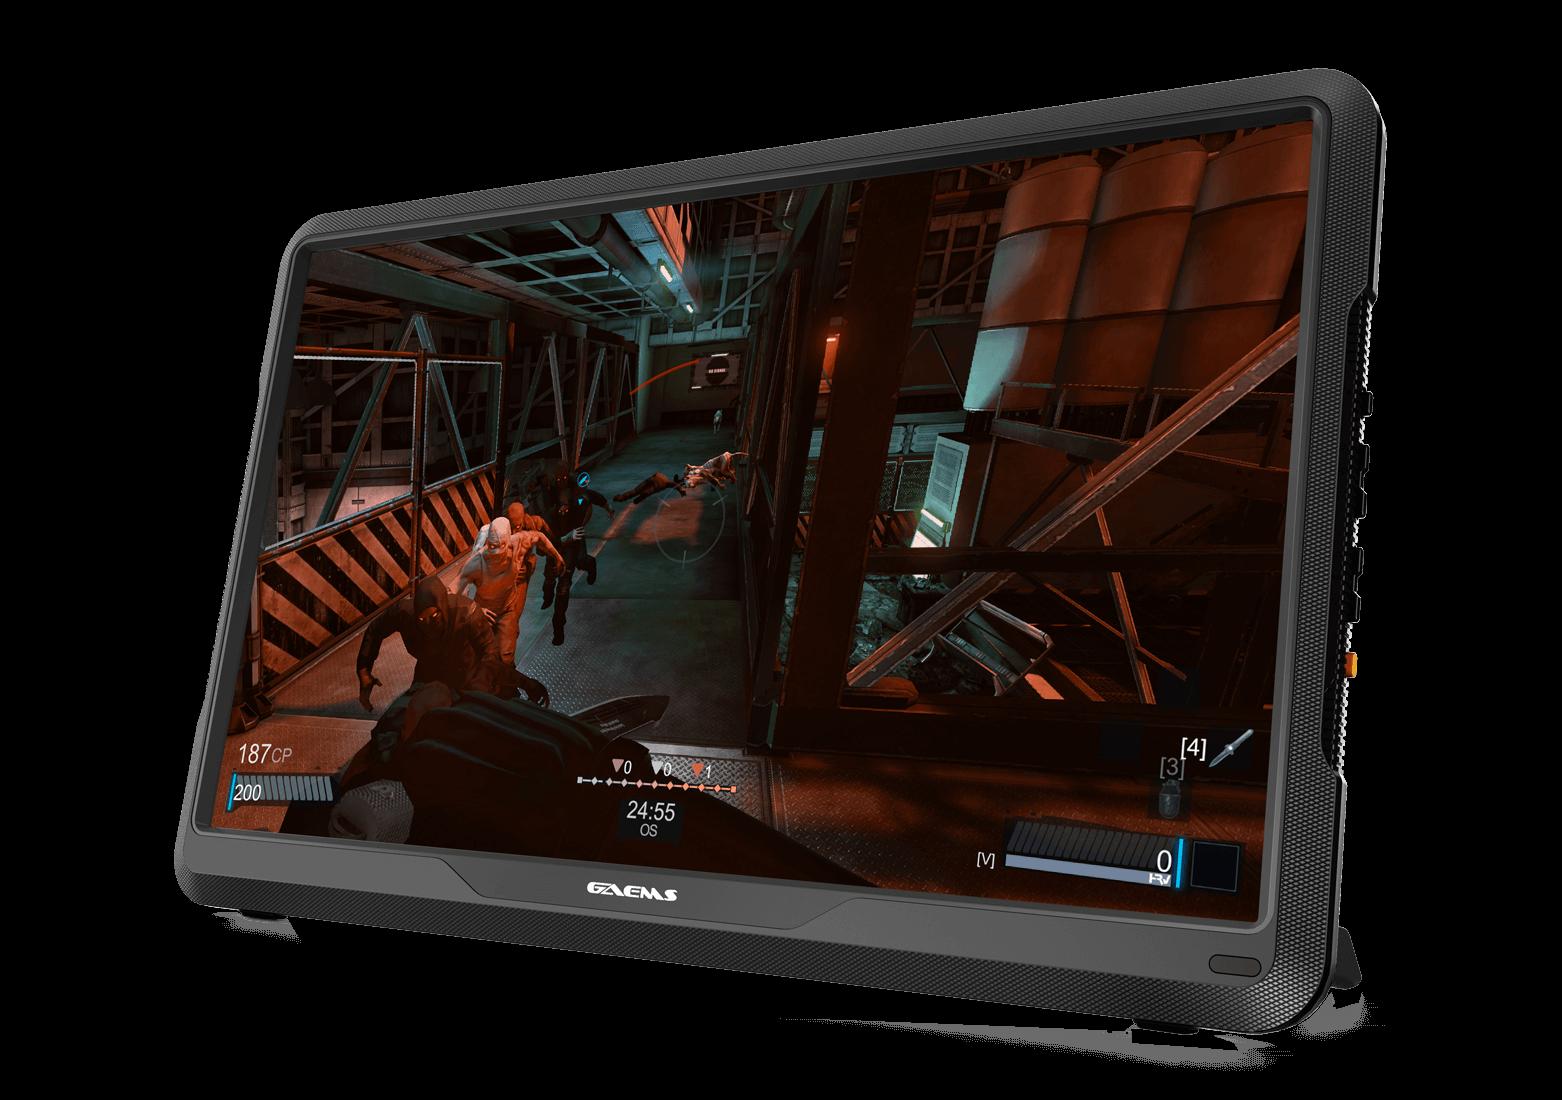 GAEMS - M155 Potable Gaming Monitor